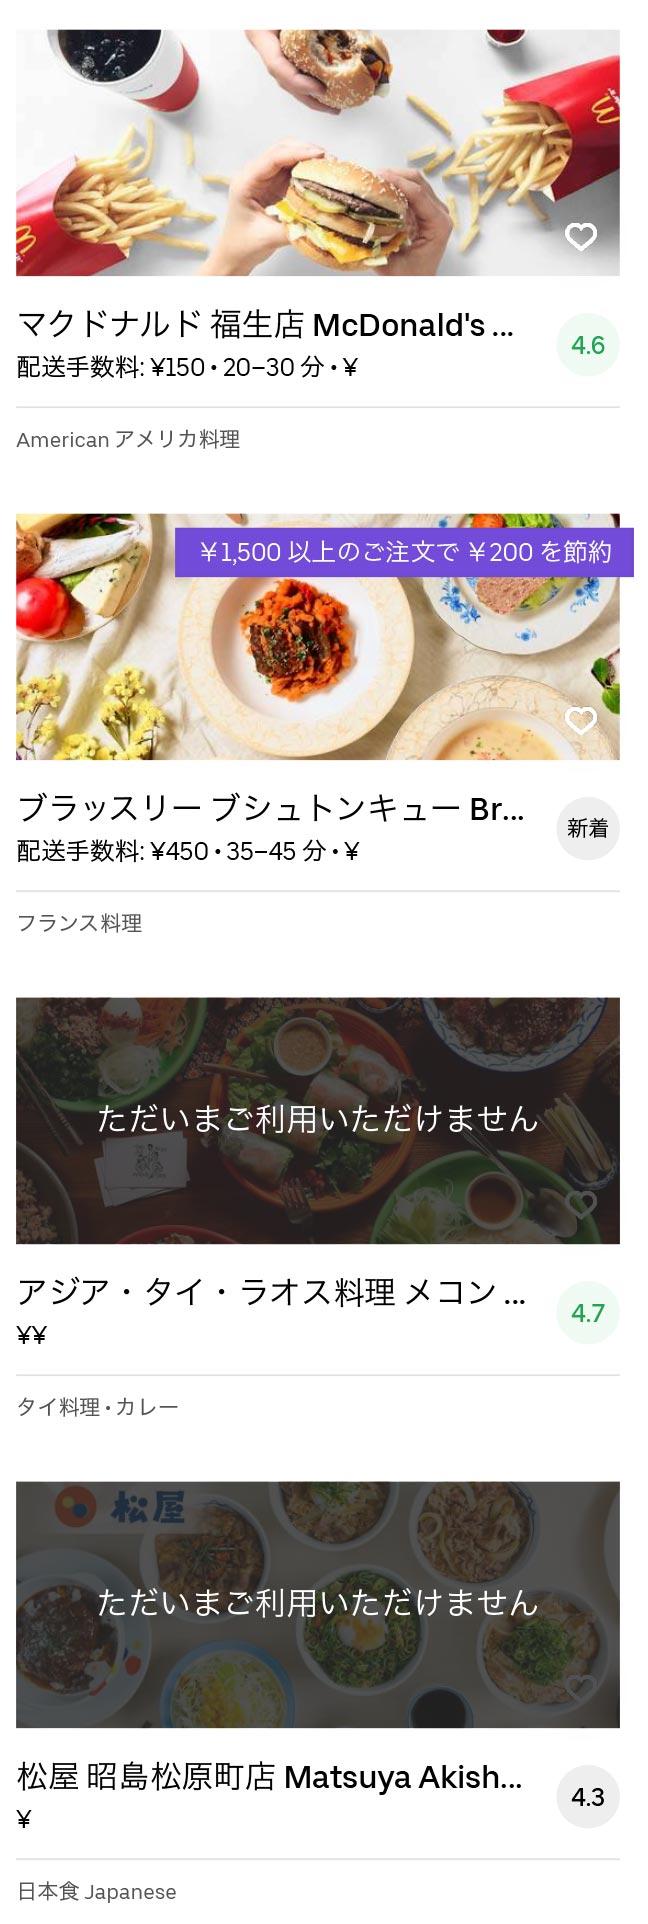 Fussa menu 2004 08